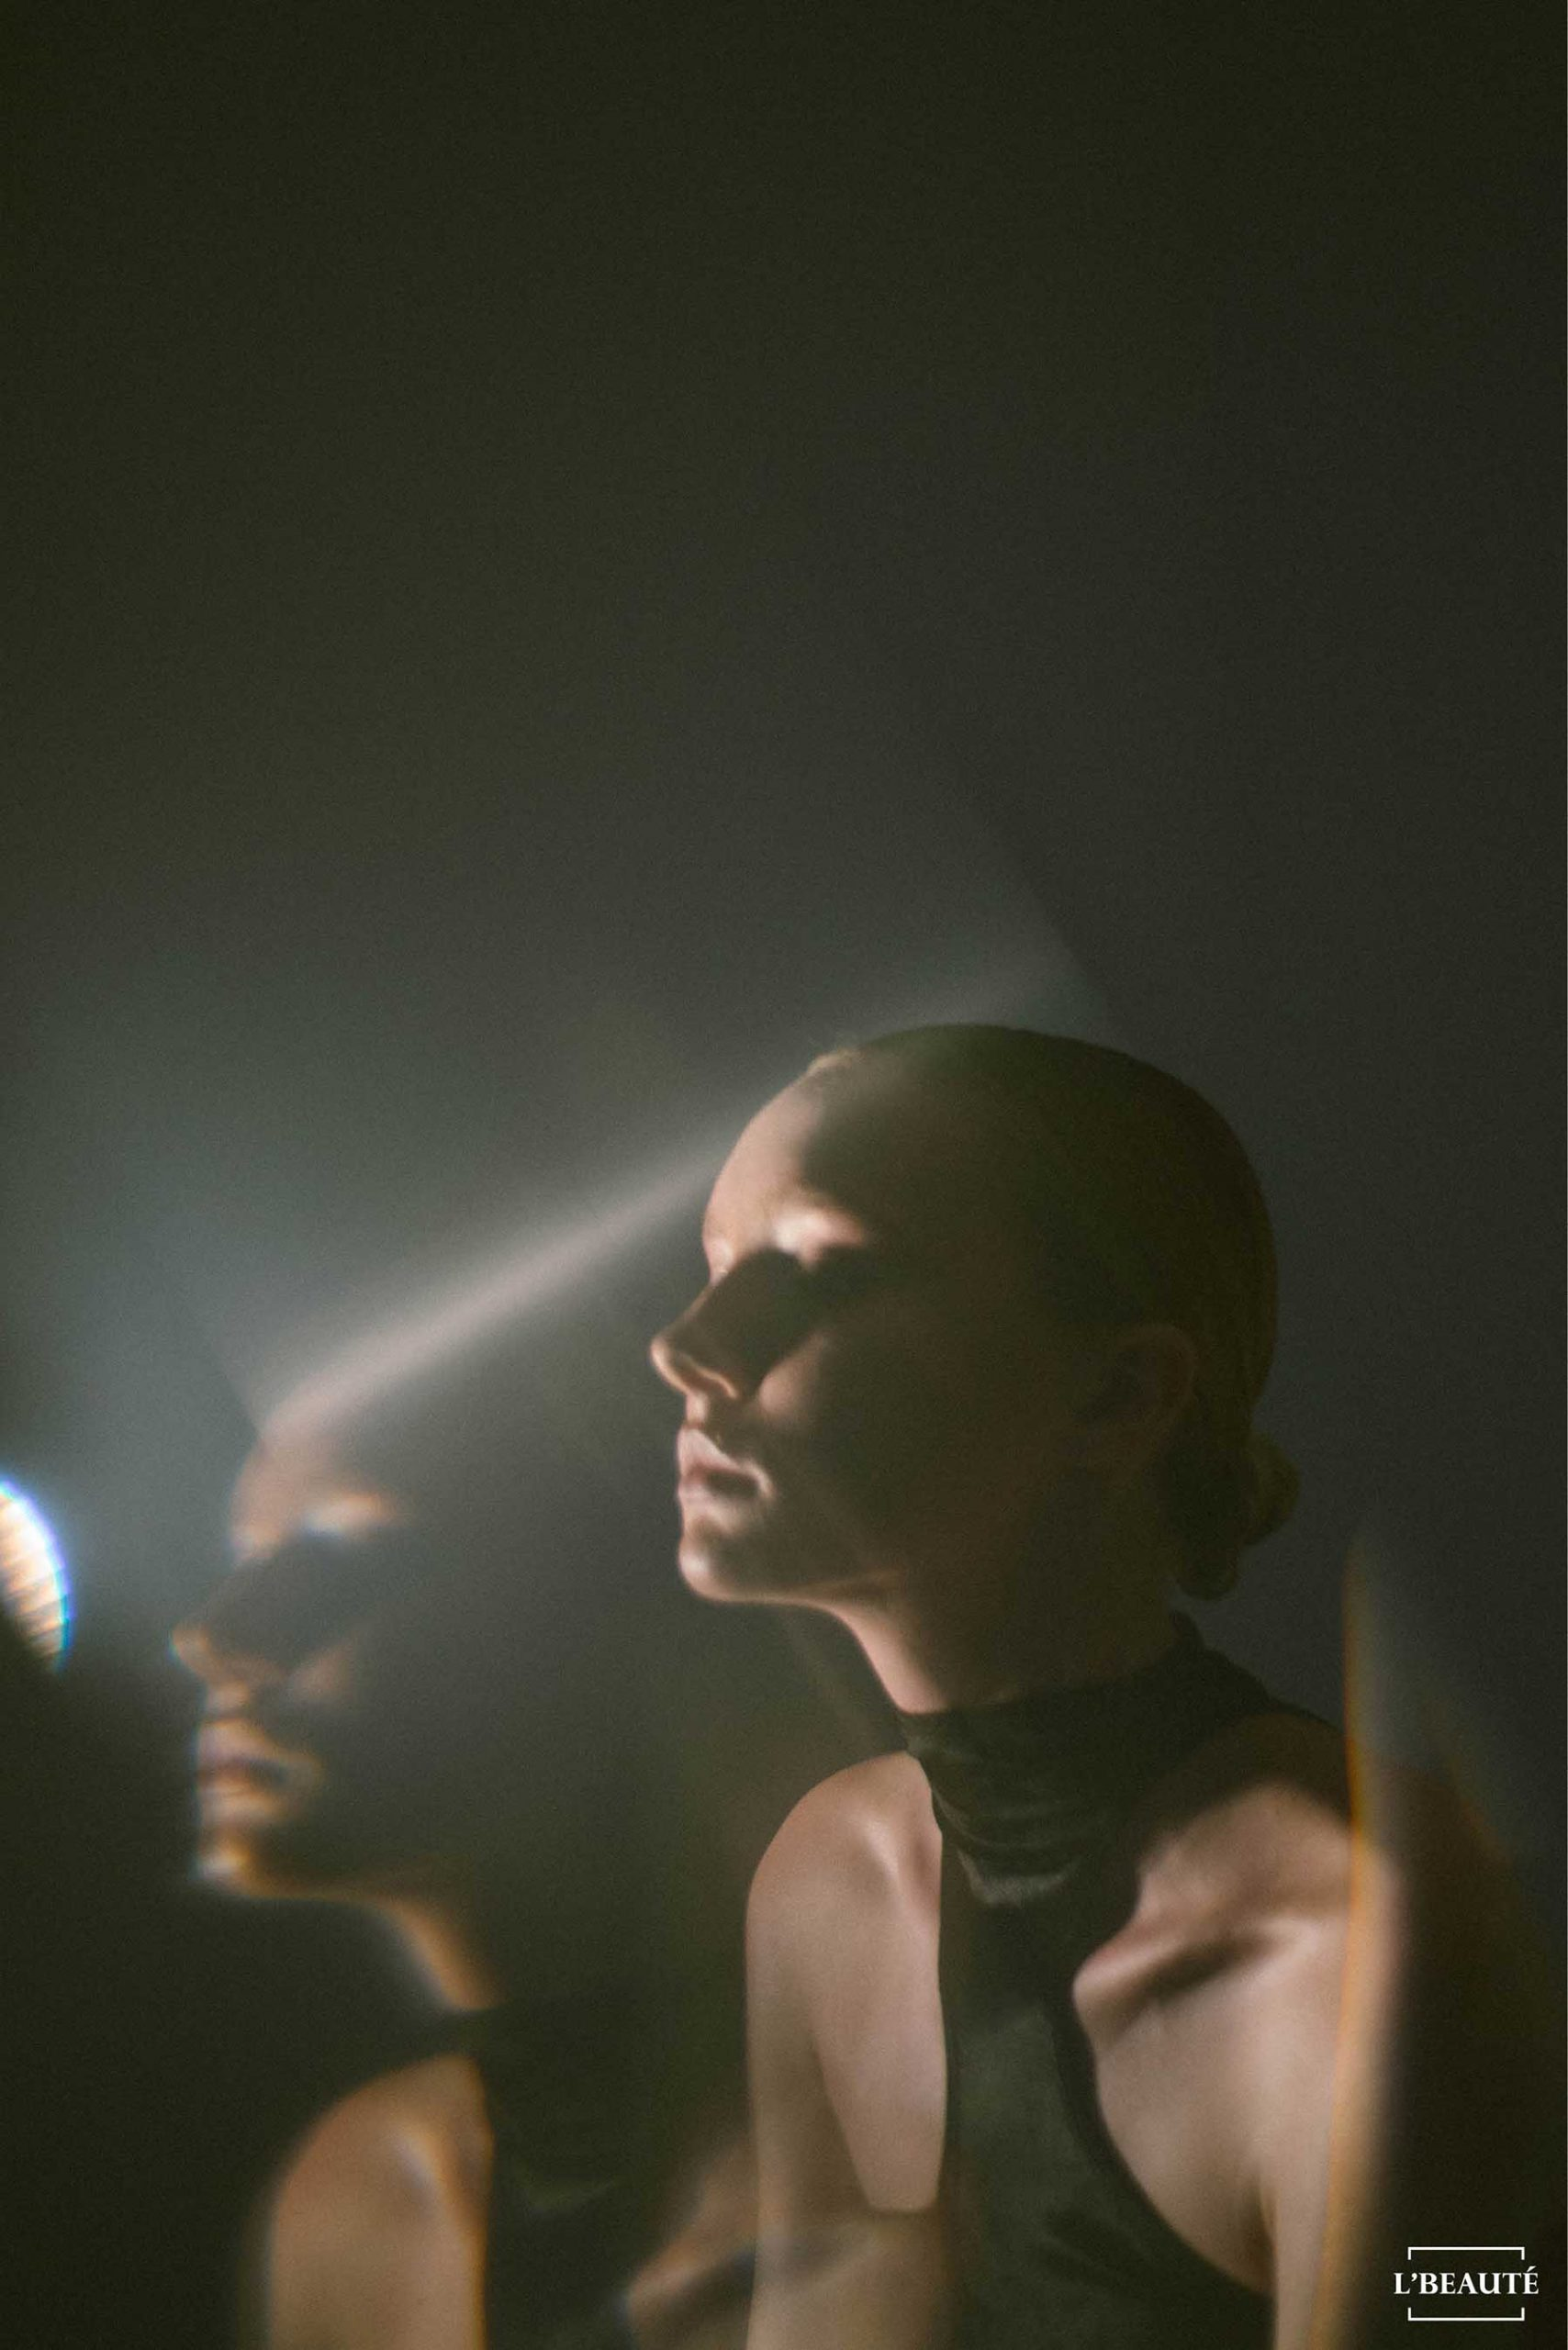 Beauty-Givenchy-Nicolas-Degennes10